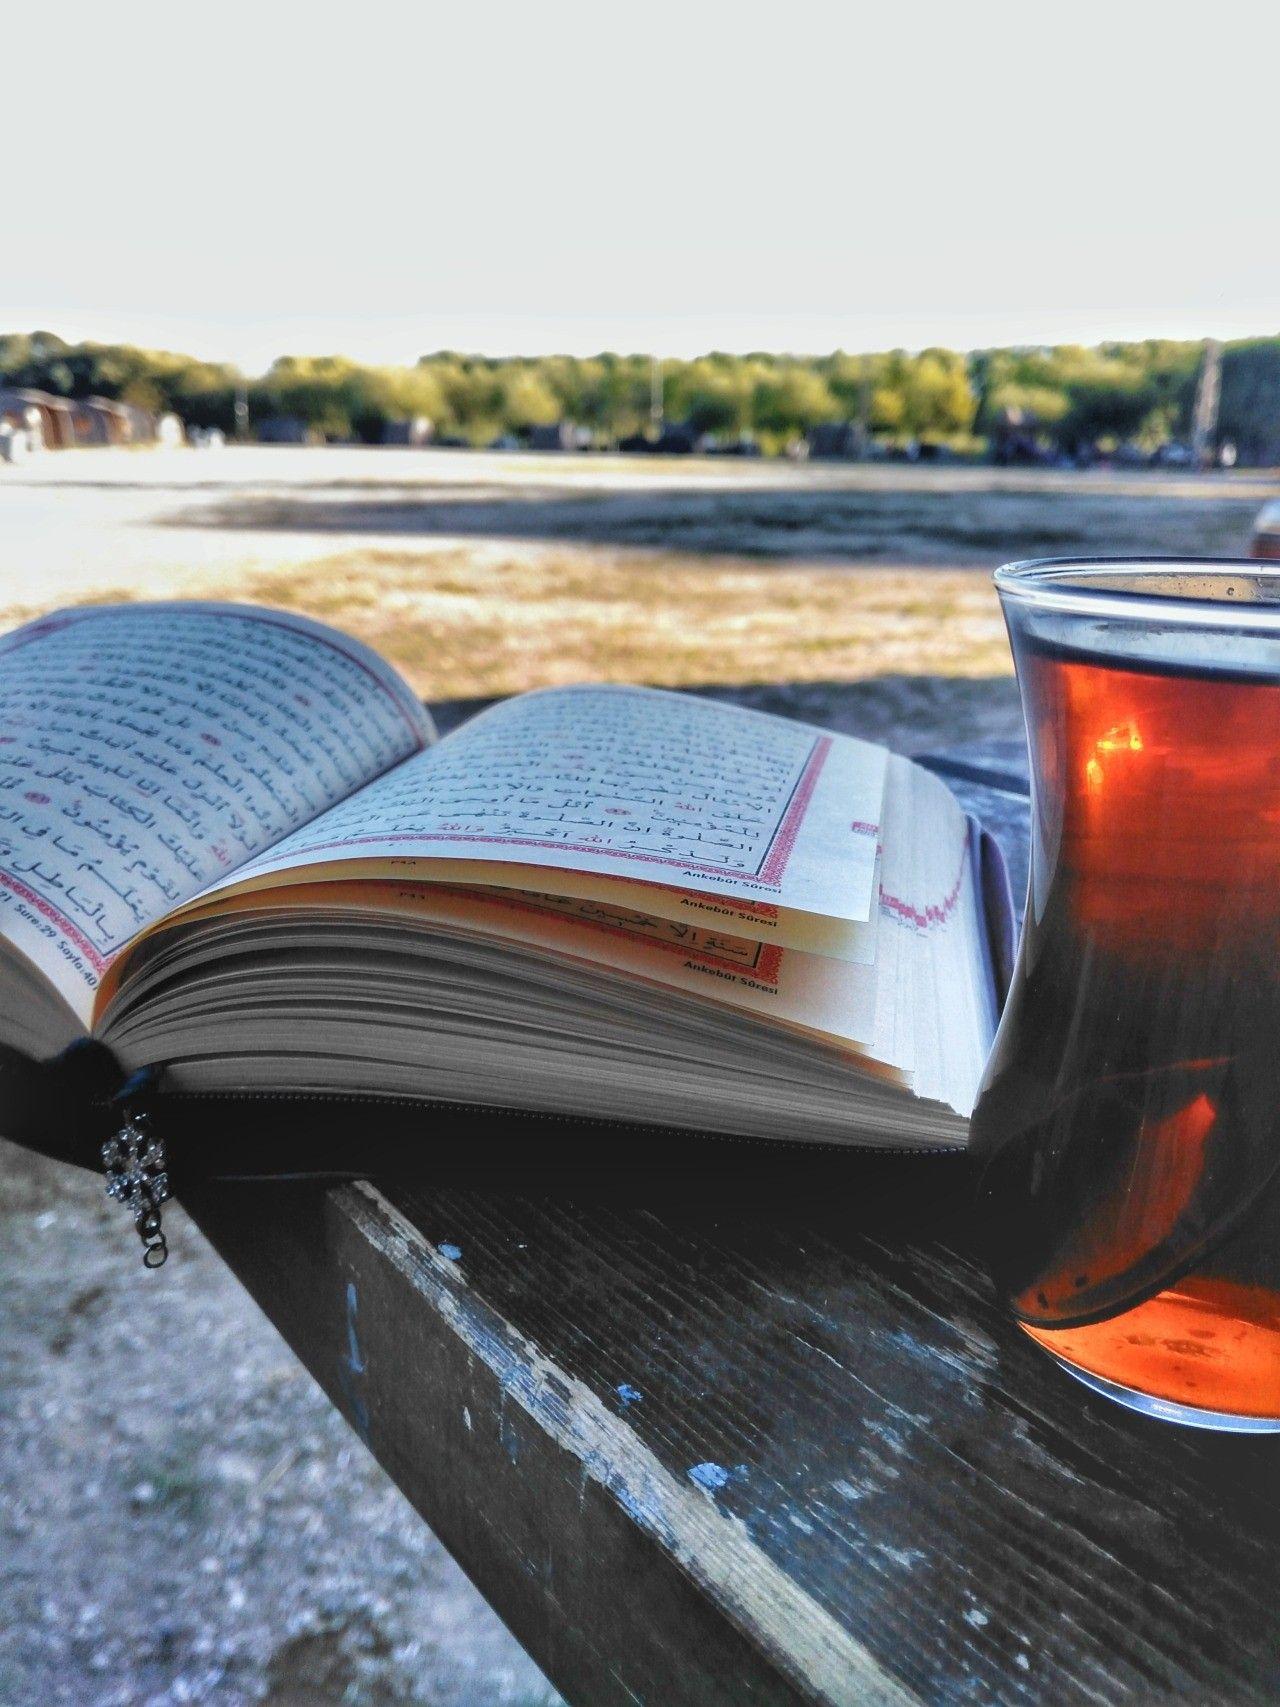 ليليان Adli Kullanicinin Cay Hafizlik Panosundaki Pin Inanc Sozleri Islam Kitap